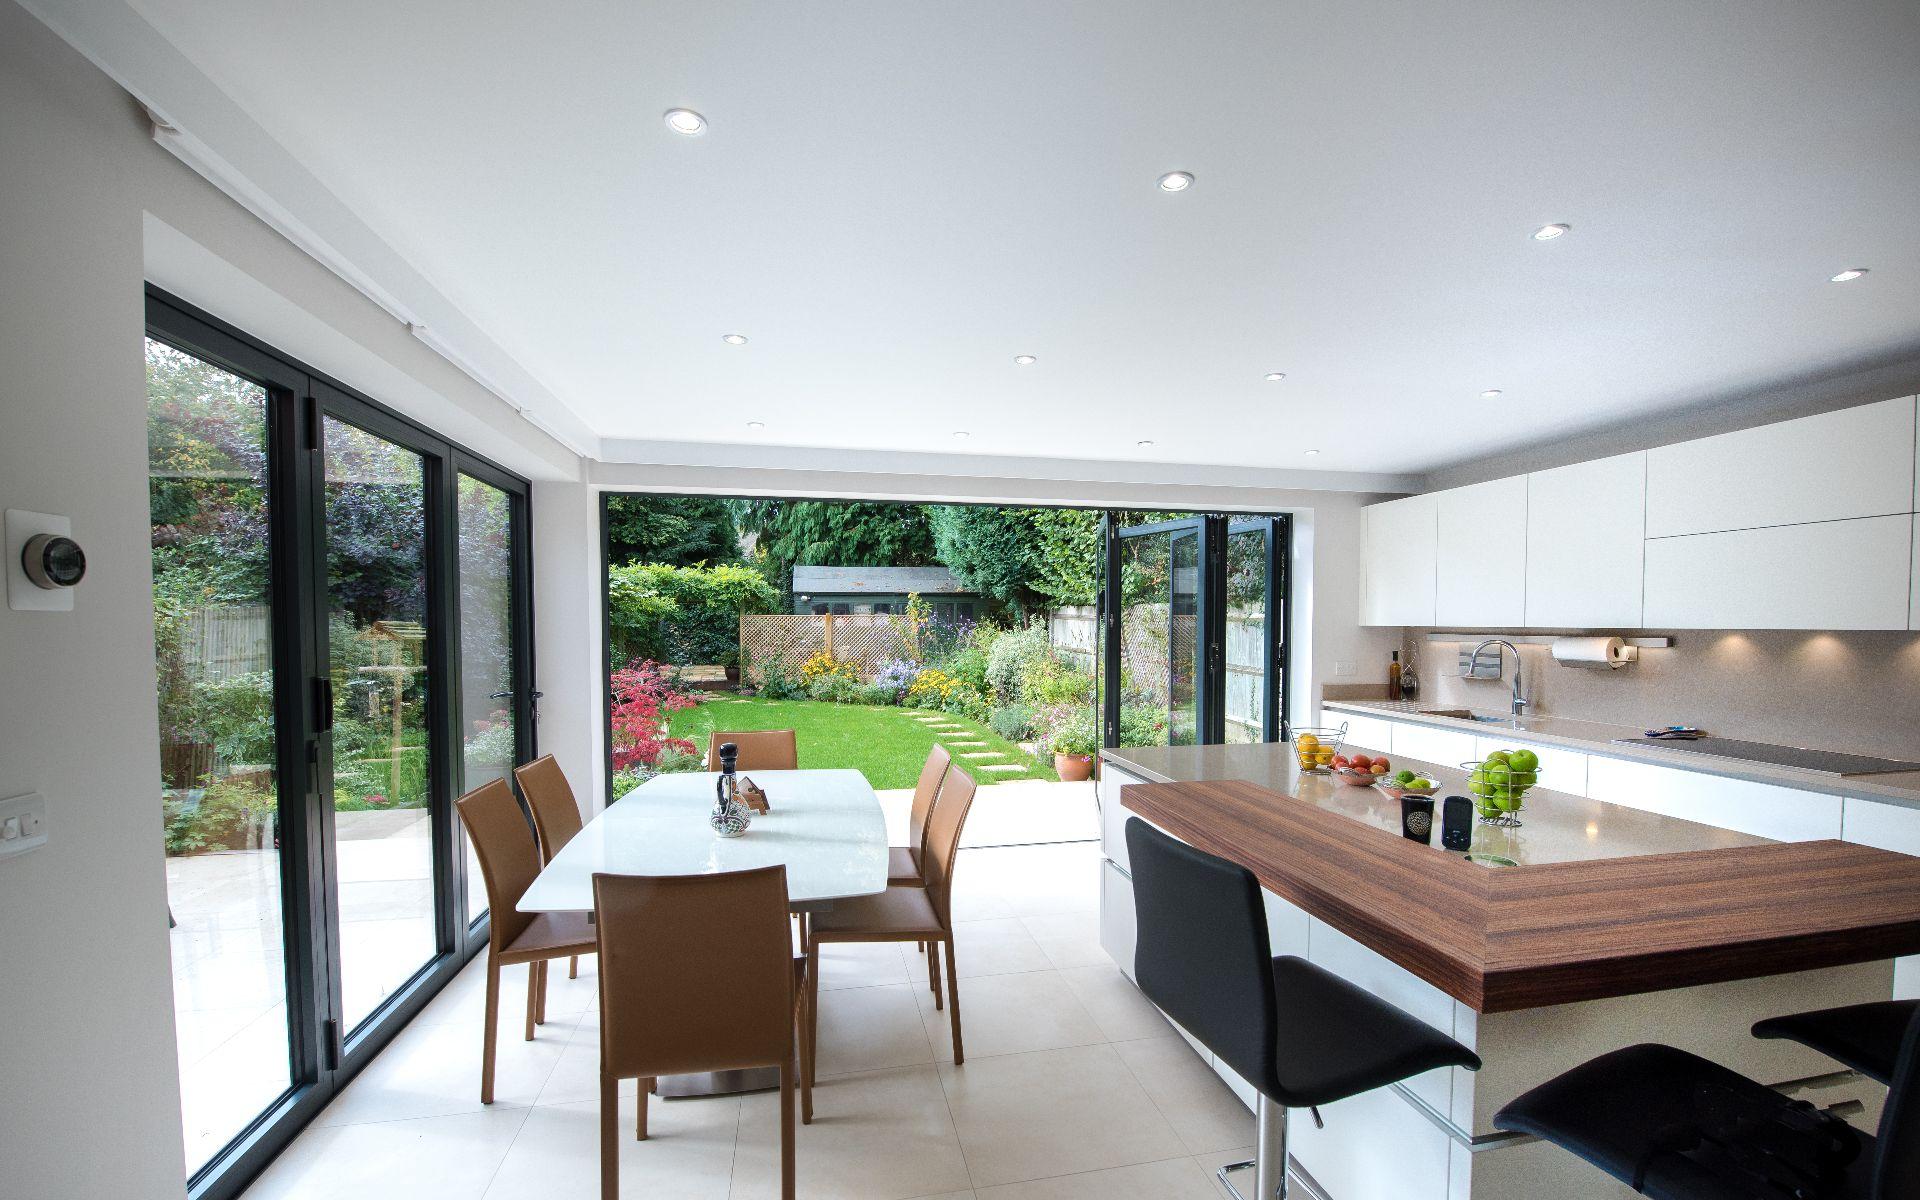 Surrey building project management services for refurbishments